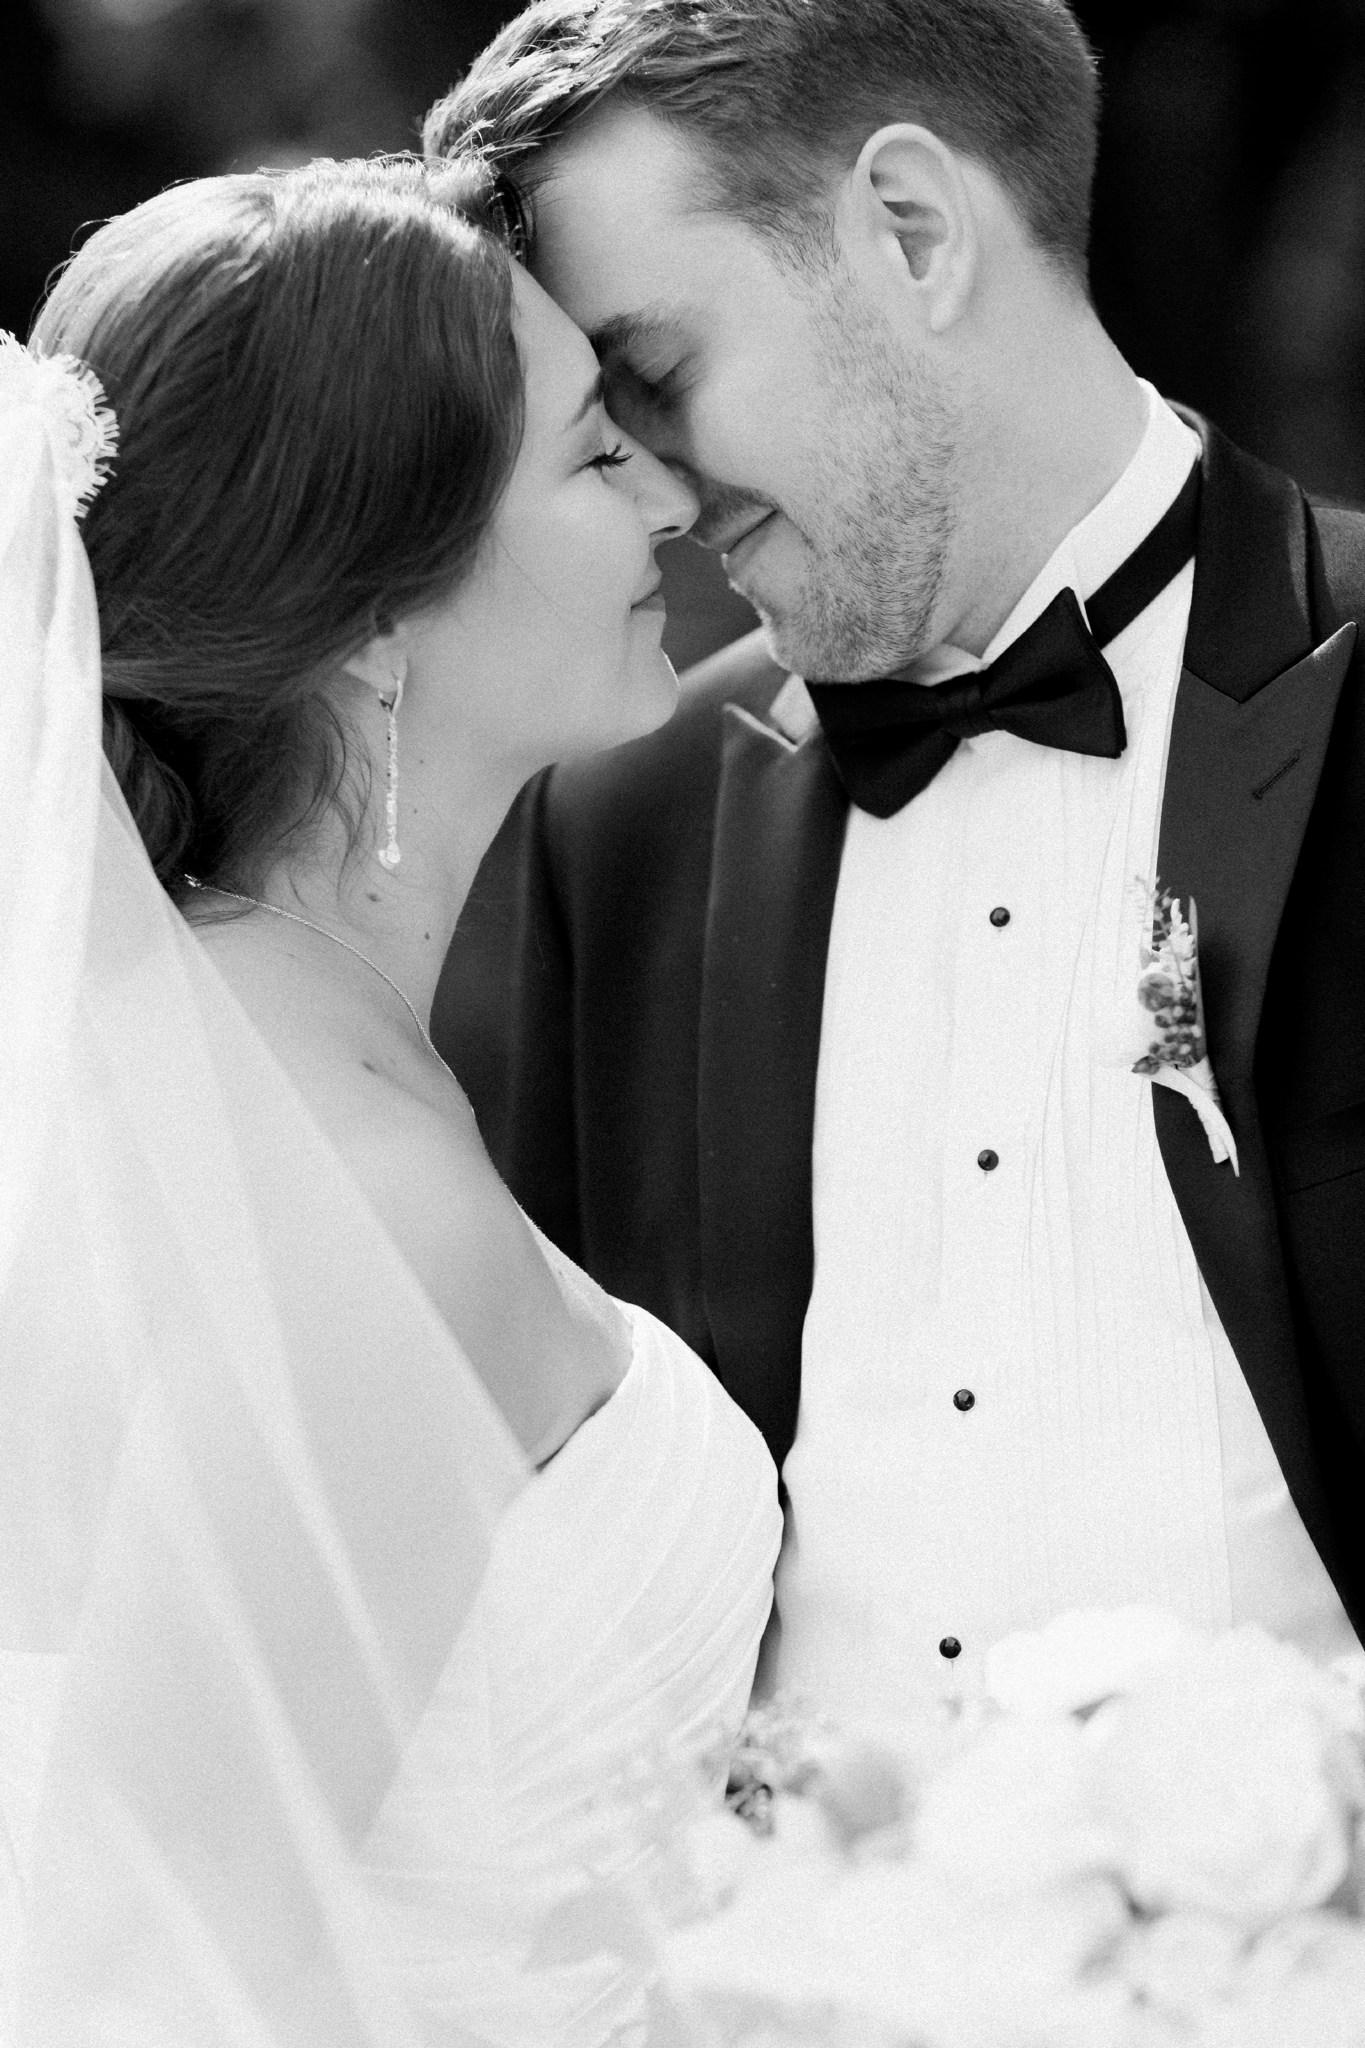 turner_hill_wedding_photos_00020.JPG